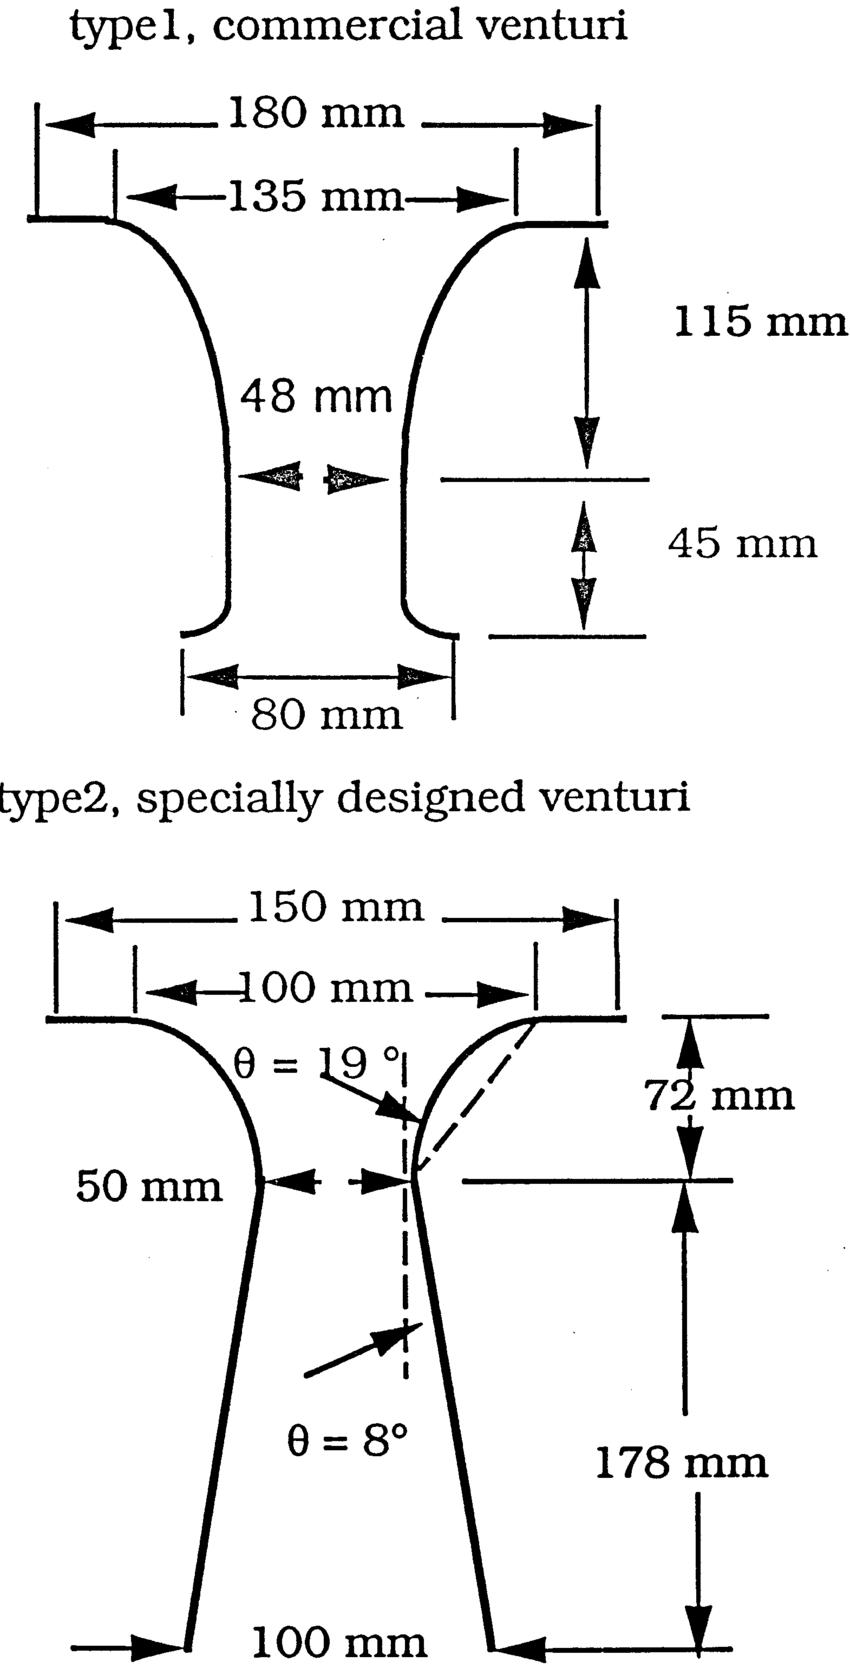 hight resolution of configuration of type 1 and type 2 venturi